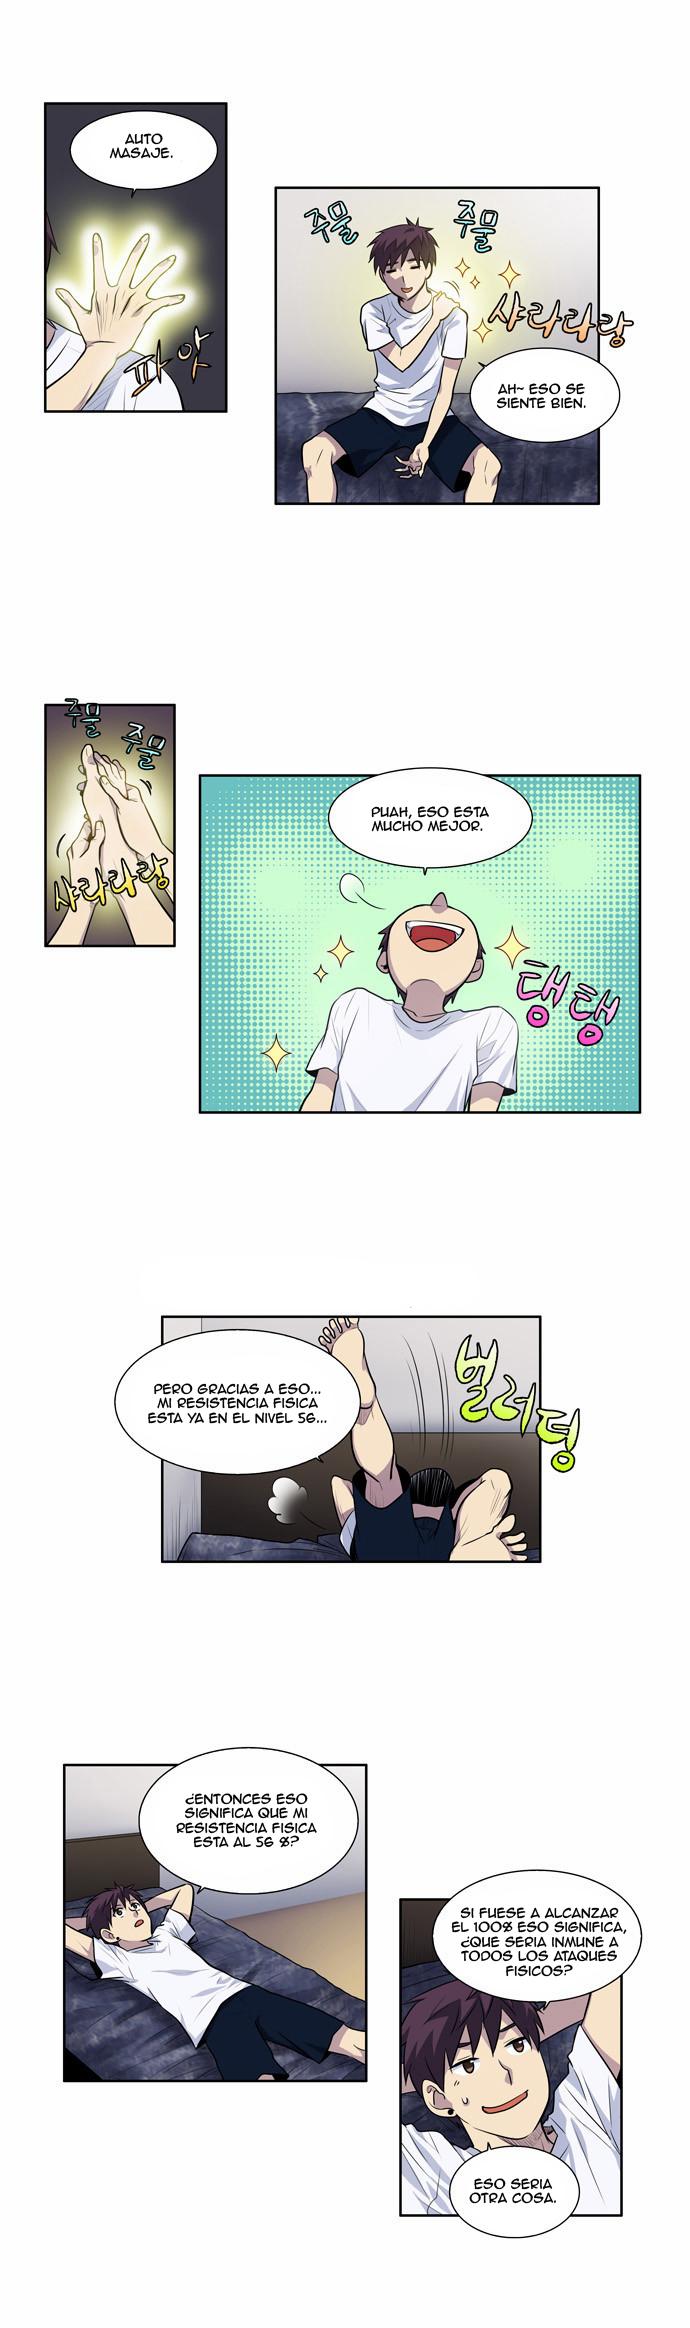 https://c5.ninemanga.com/es_manga/61/1725/419329/90398bbeb94cc0d80e6d54bfa7c8b3d2.jpg Page 3